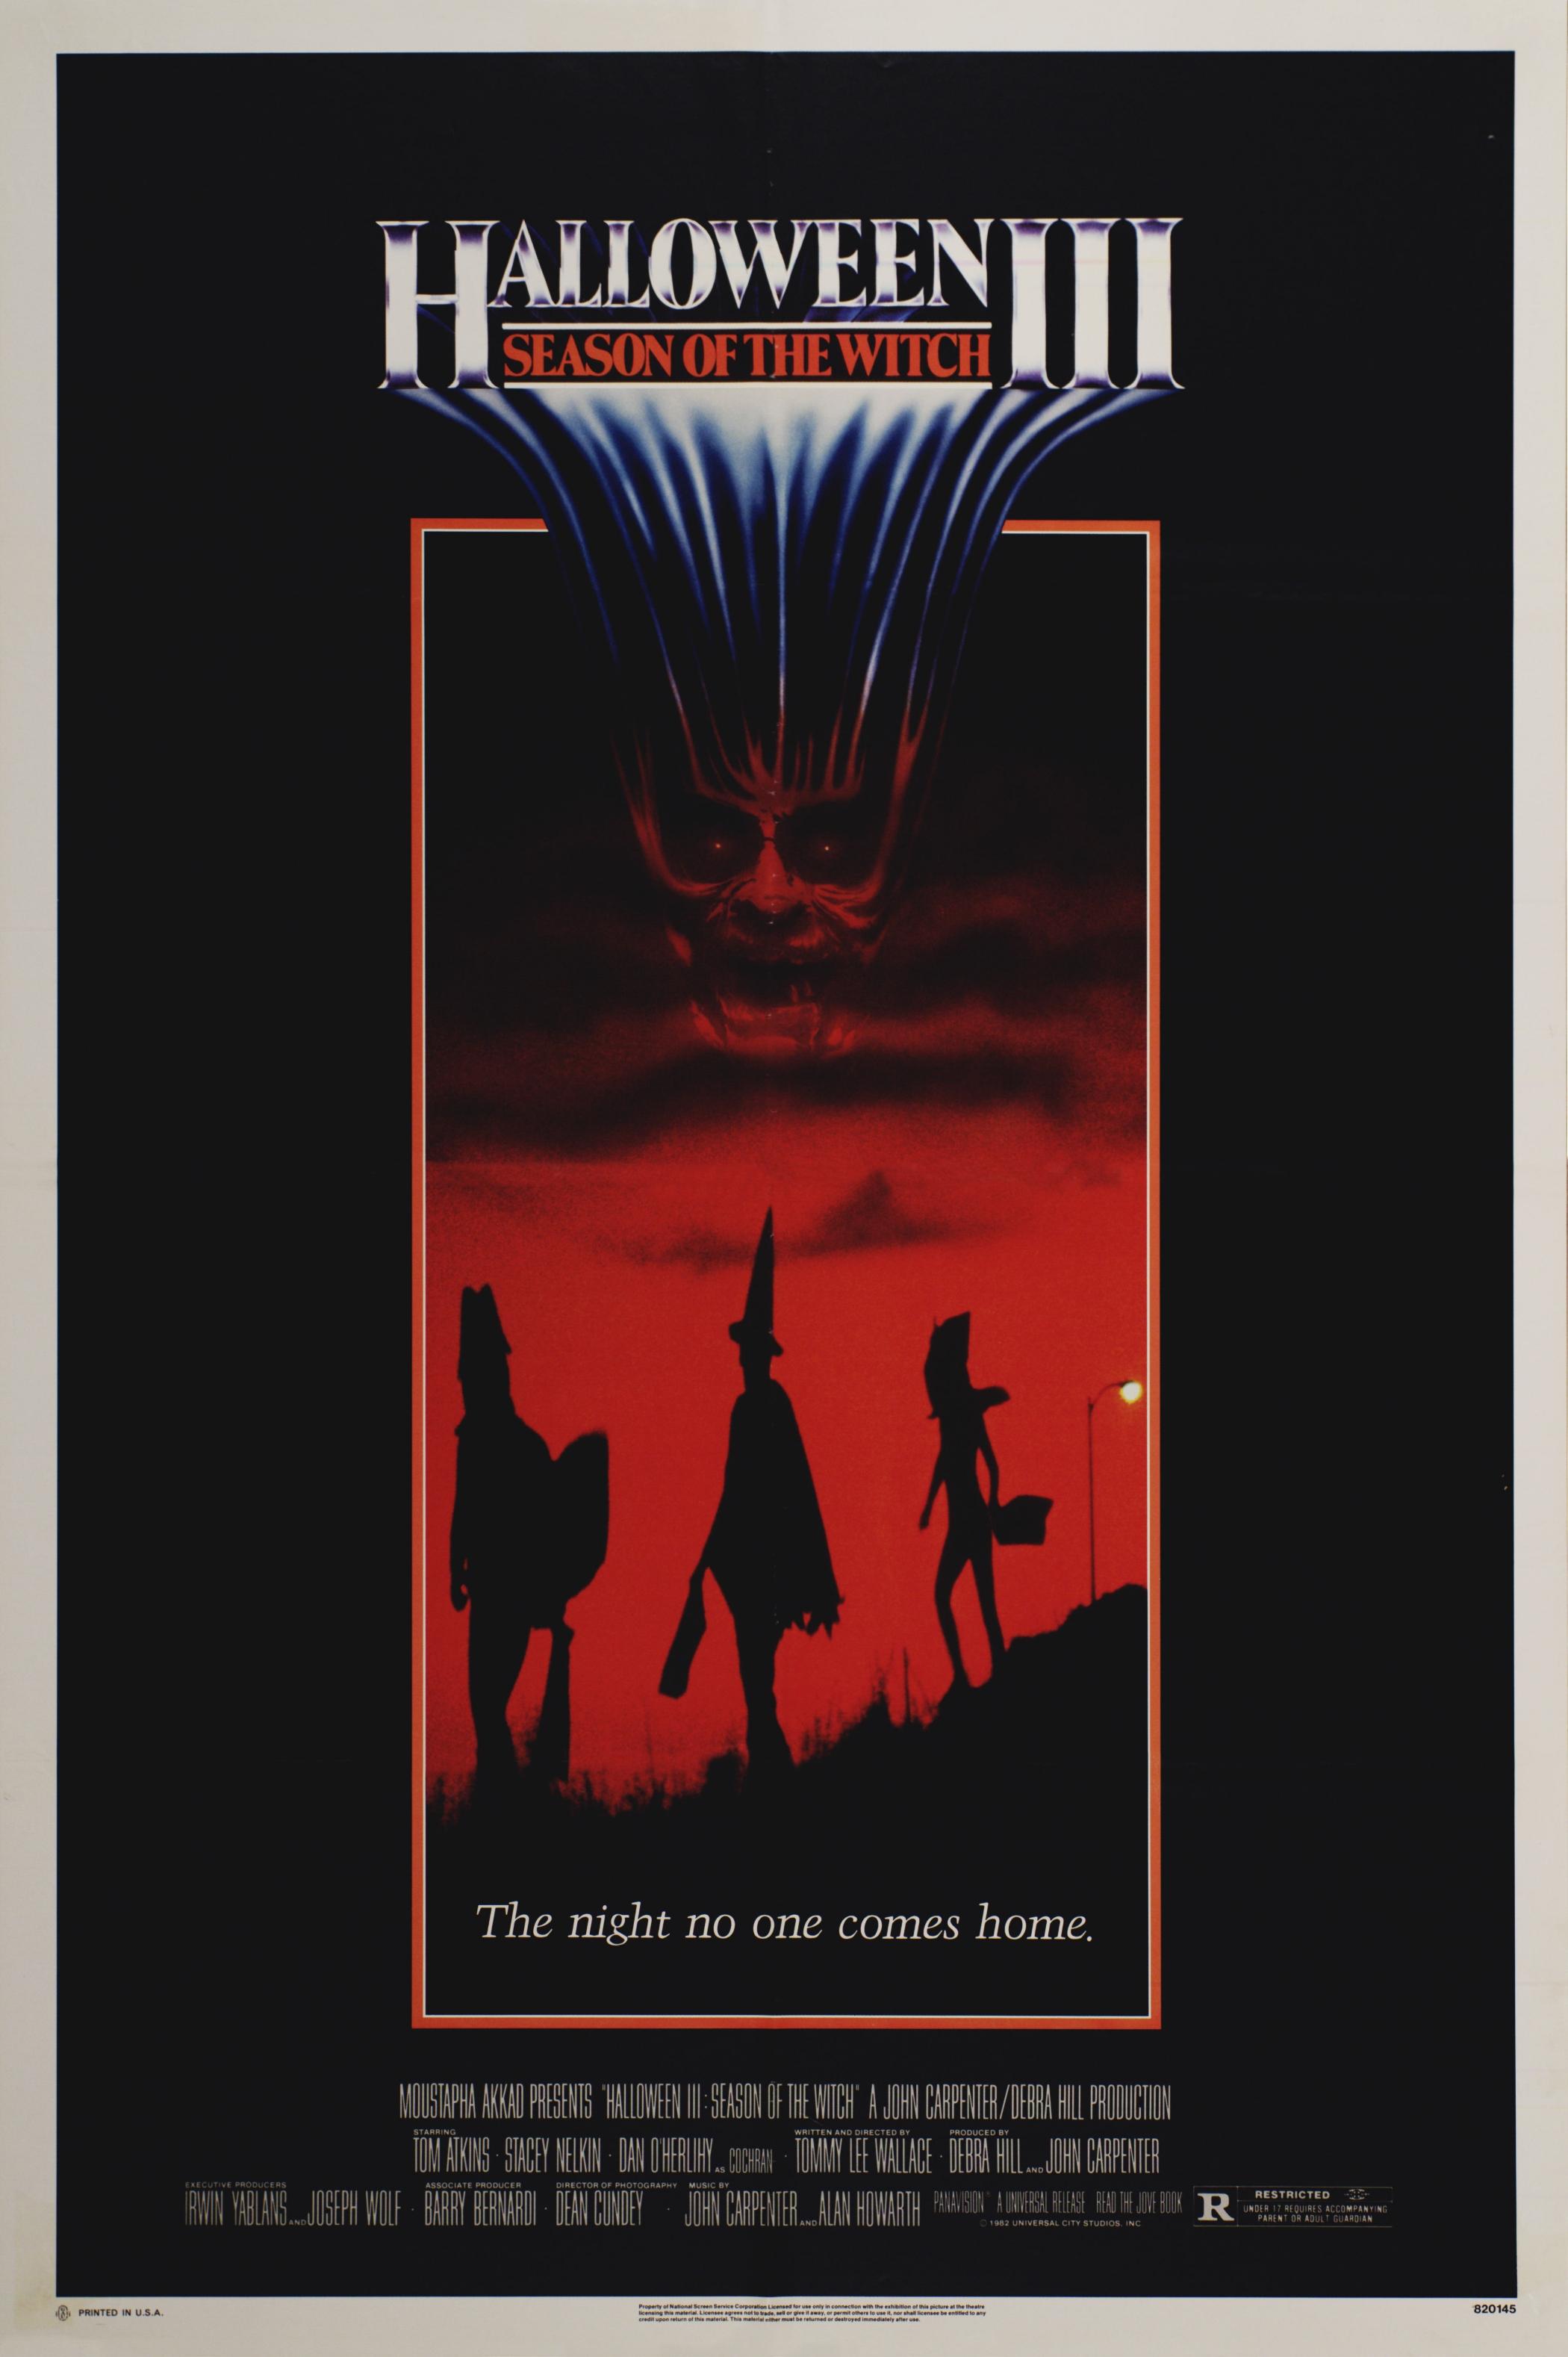 плакат фильма постер Хэллоуин 3: Сезон ведьм*